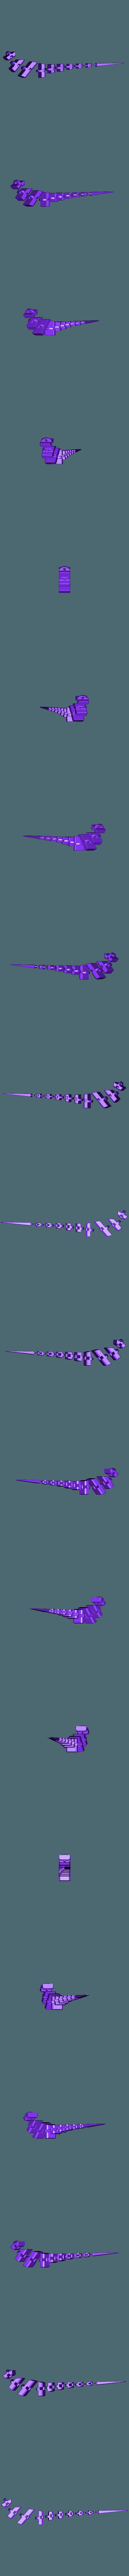 Flexi_RaptorB.stl Download free STL file Flexi Raptor (Dual Extrusion) • 3D print model, Adafruit